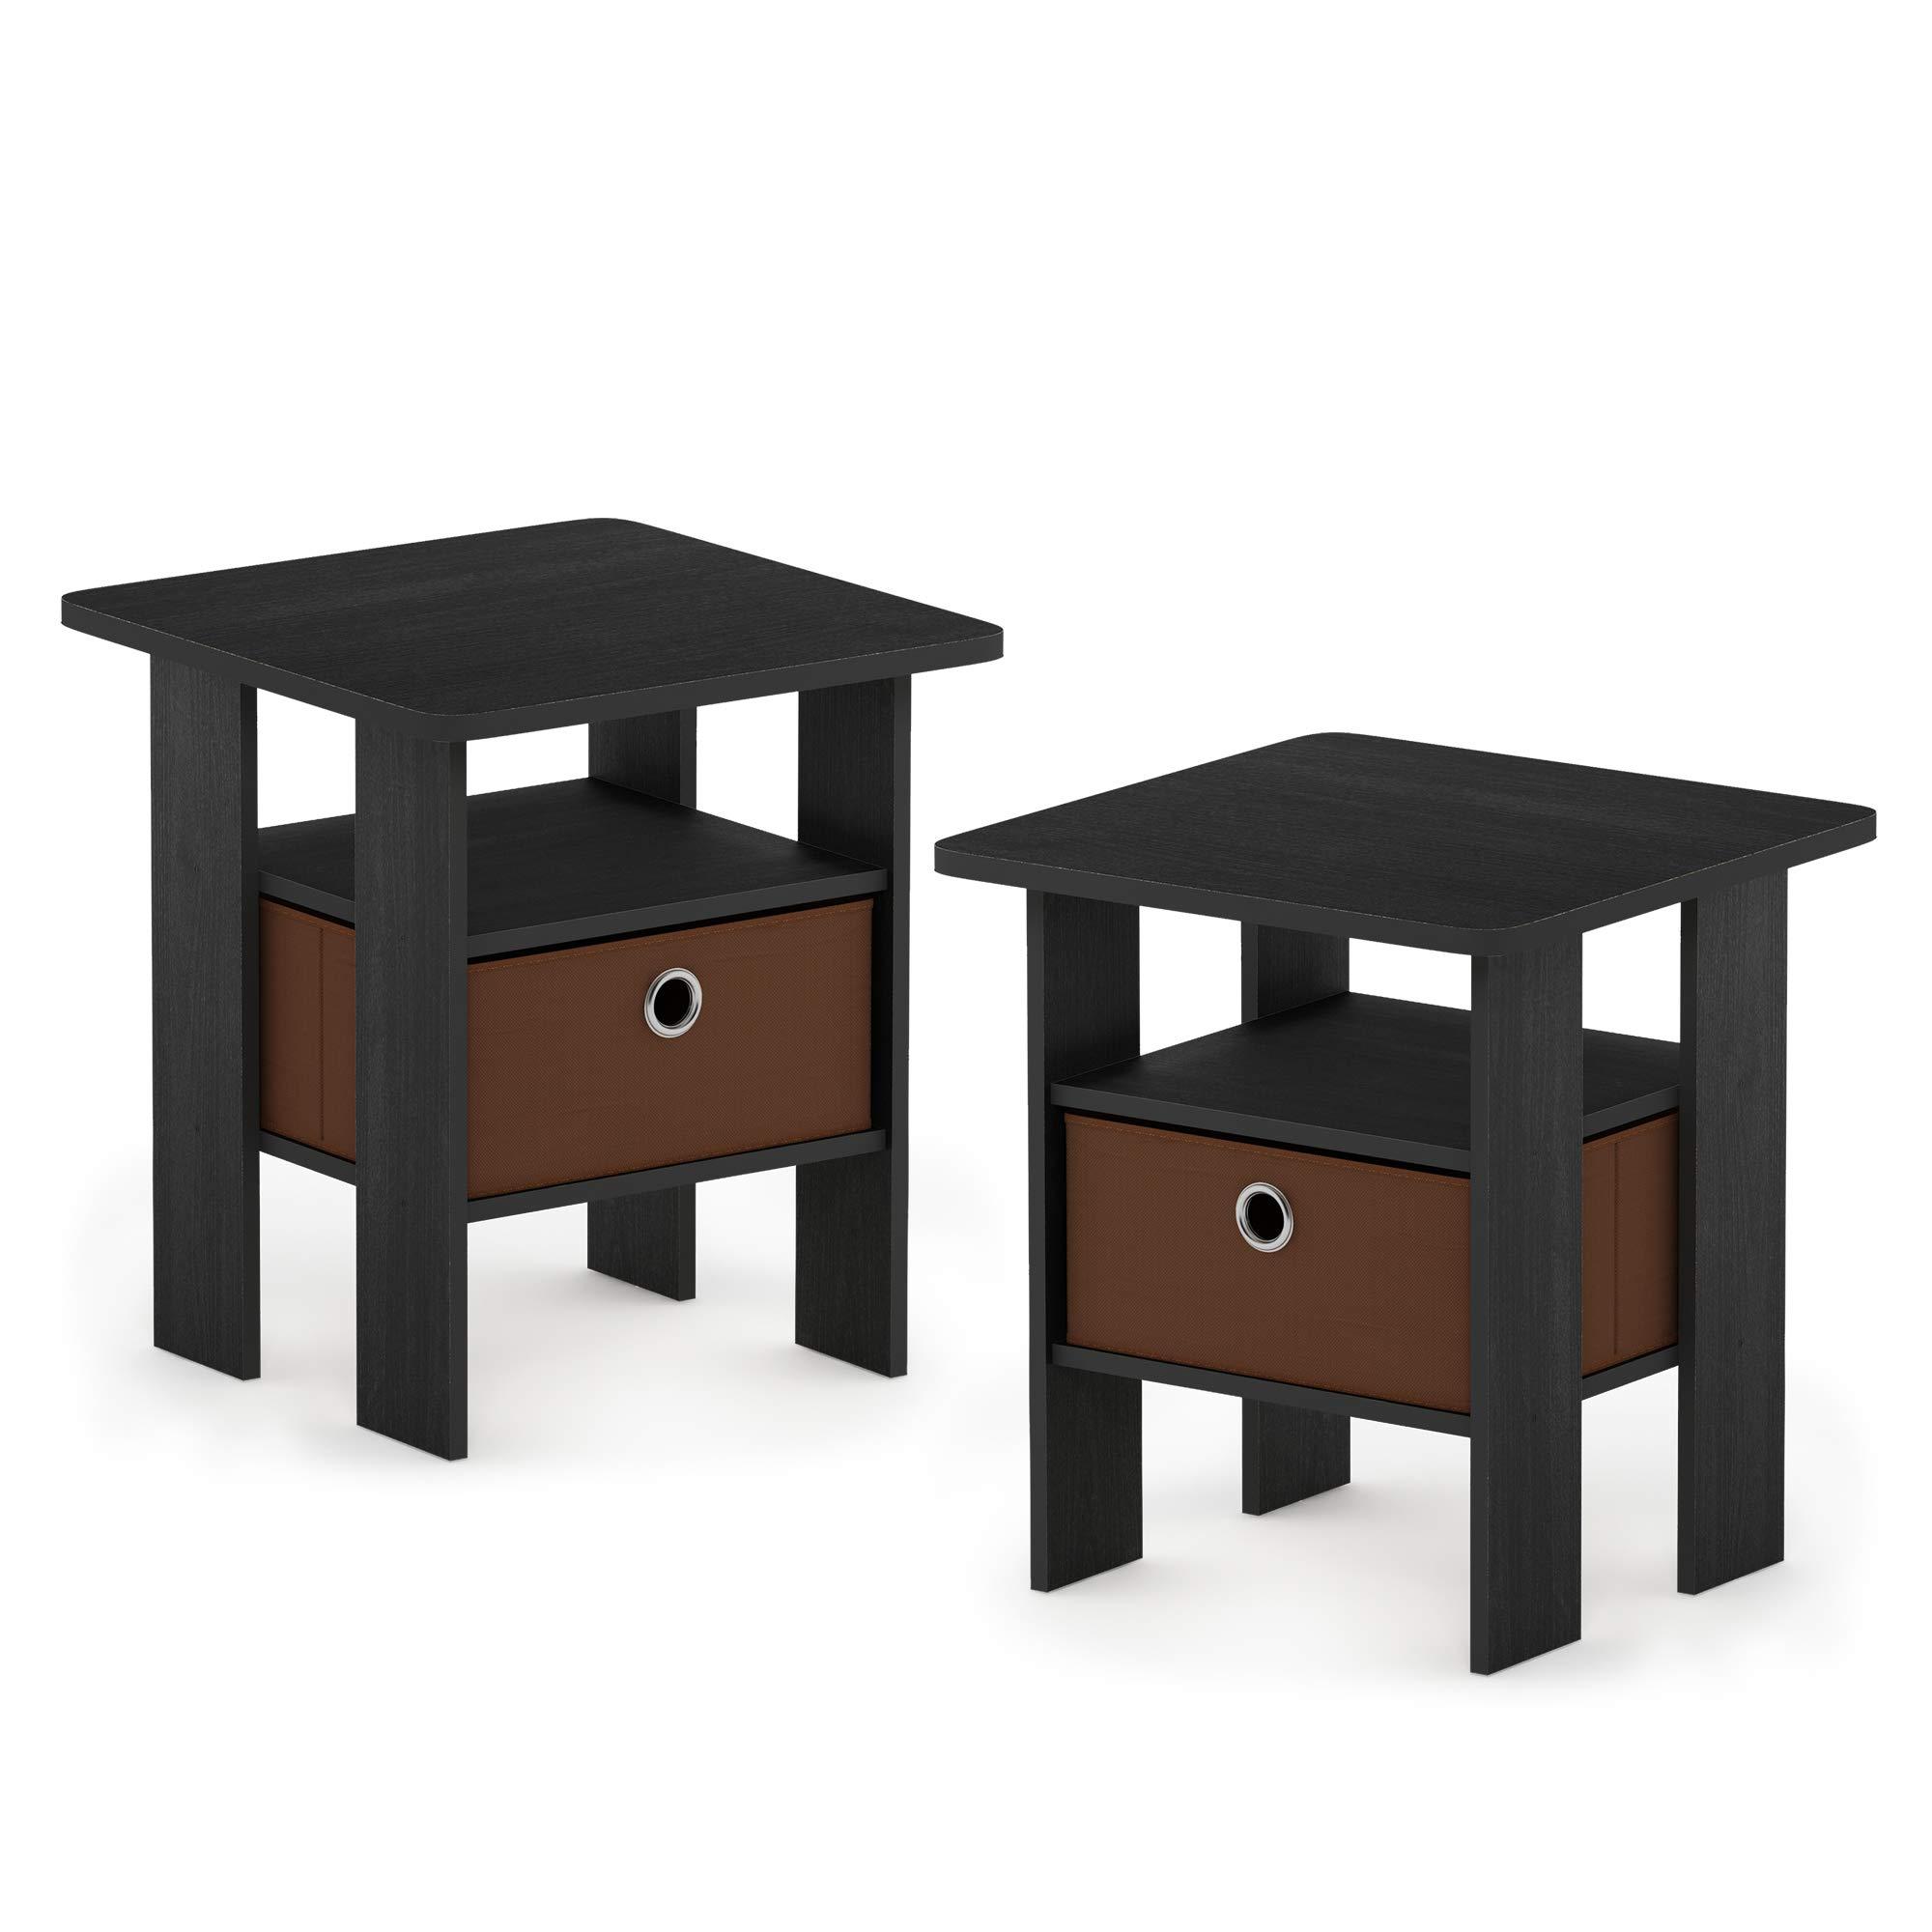 Furinno 2-11157AM Andrey 2-Pack Bin Drawer End Table Nightstand, Americano/Medium Brown